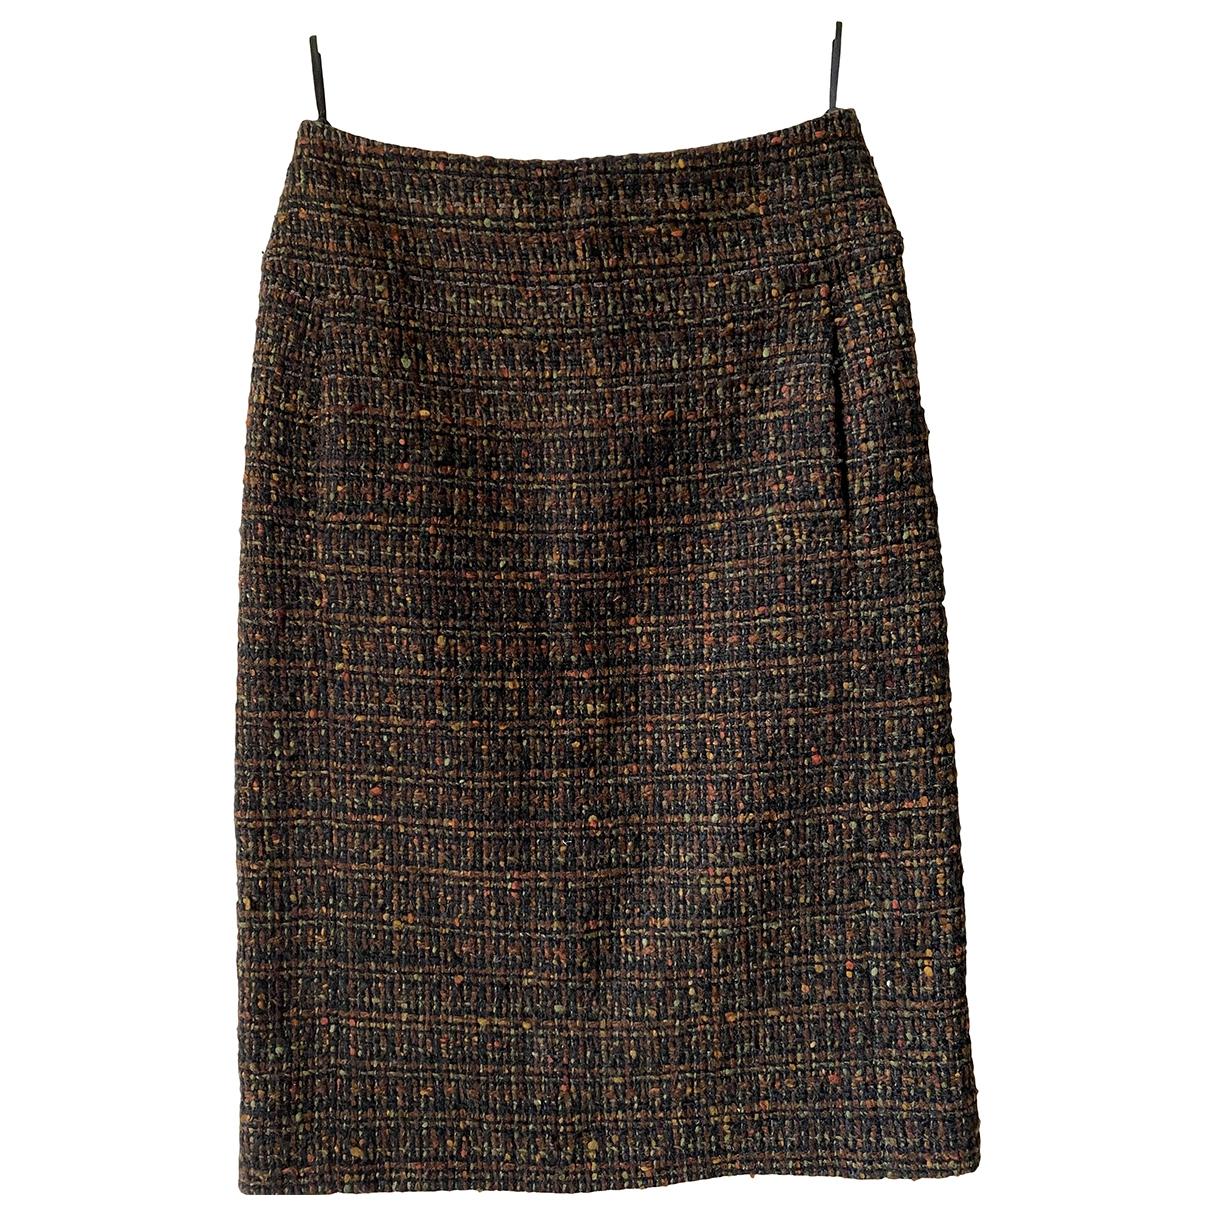 Chanel \N Brown Wool skirt for Women 38 FR